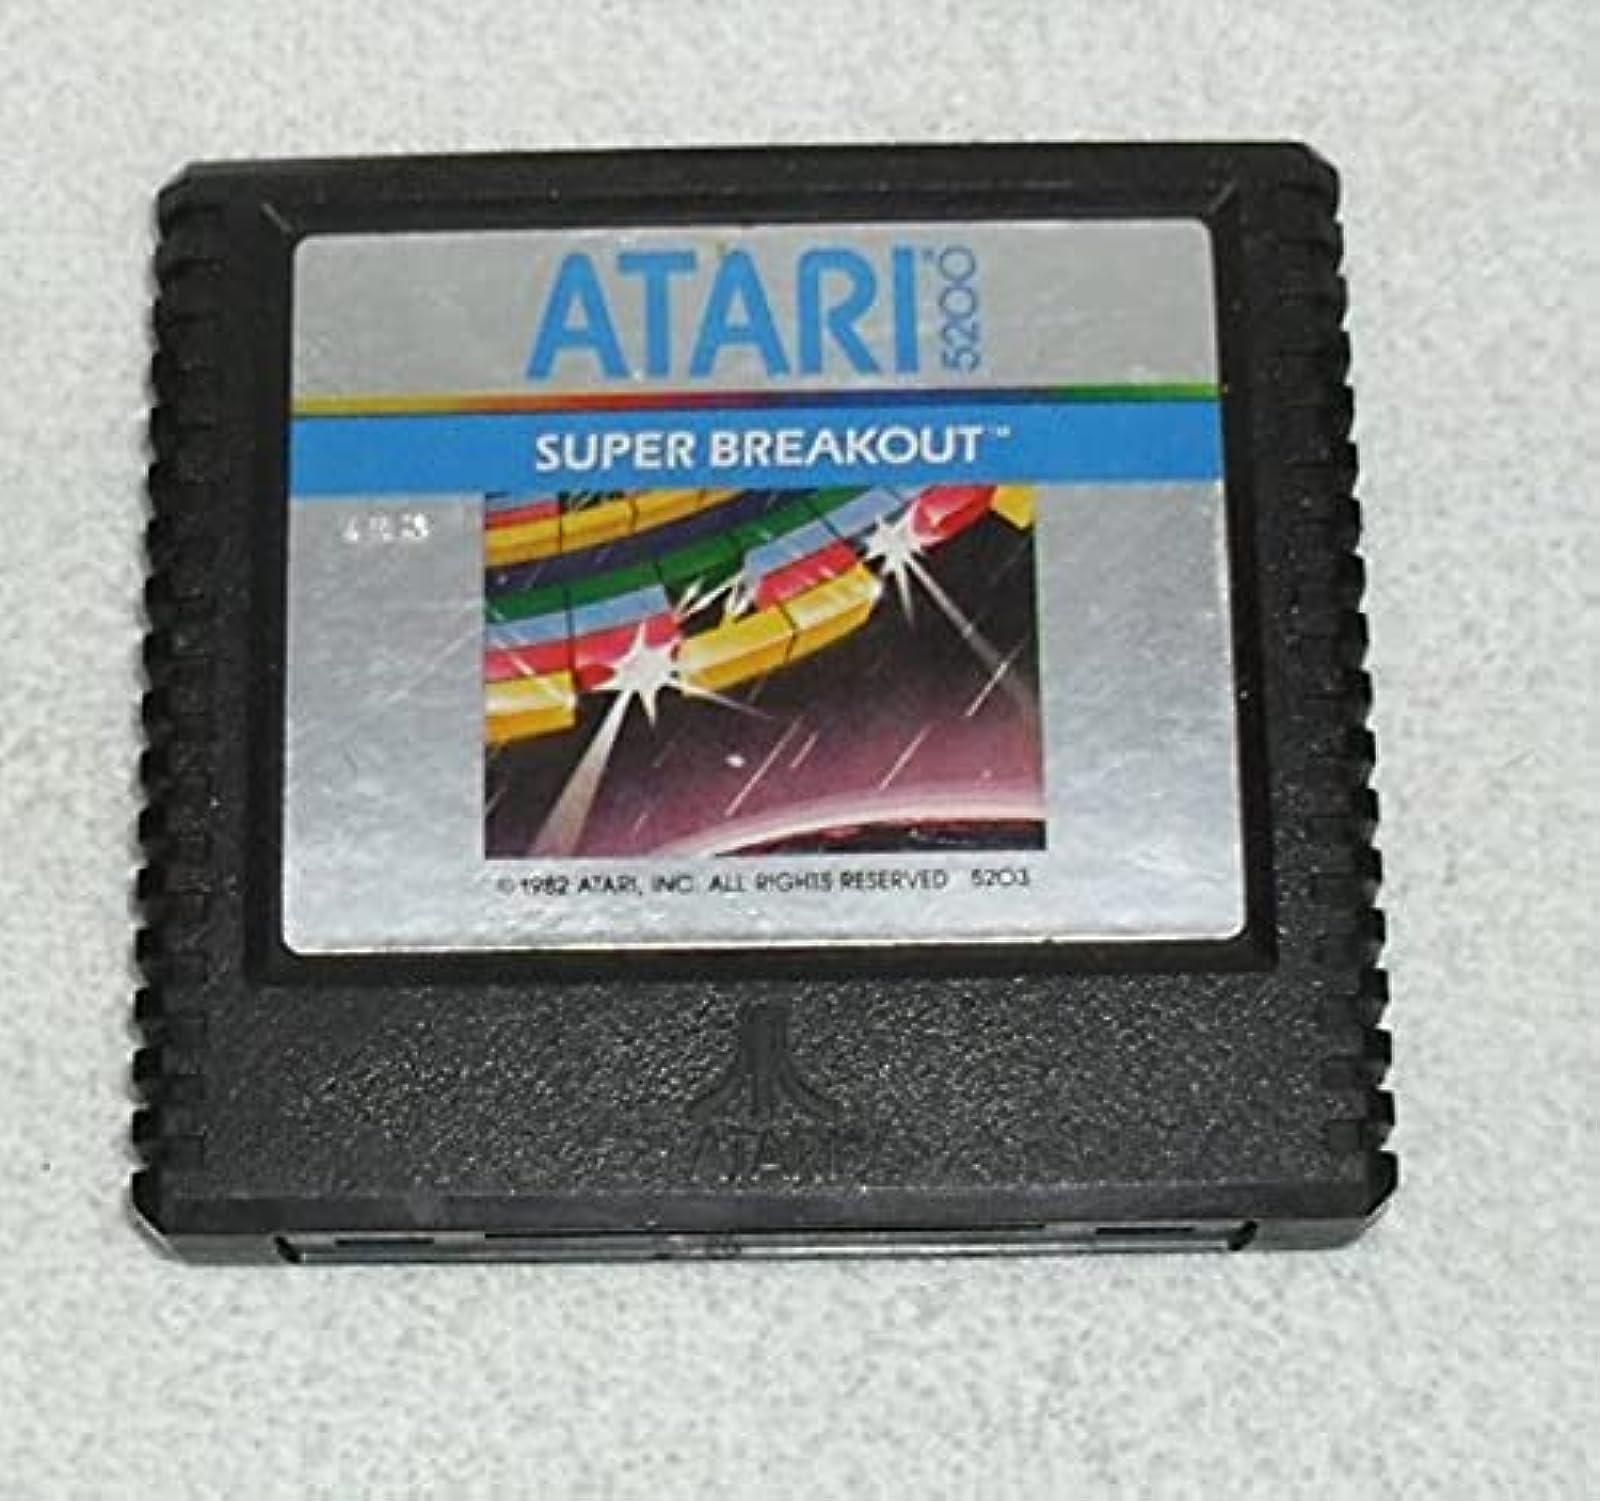 Super Breakout For Atari Vintage Arcade